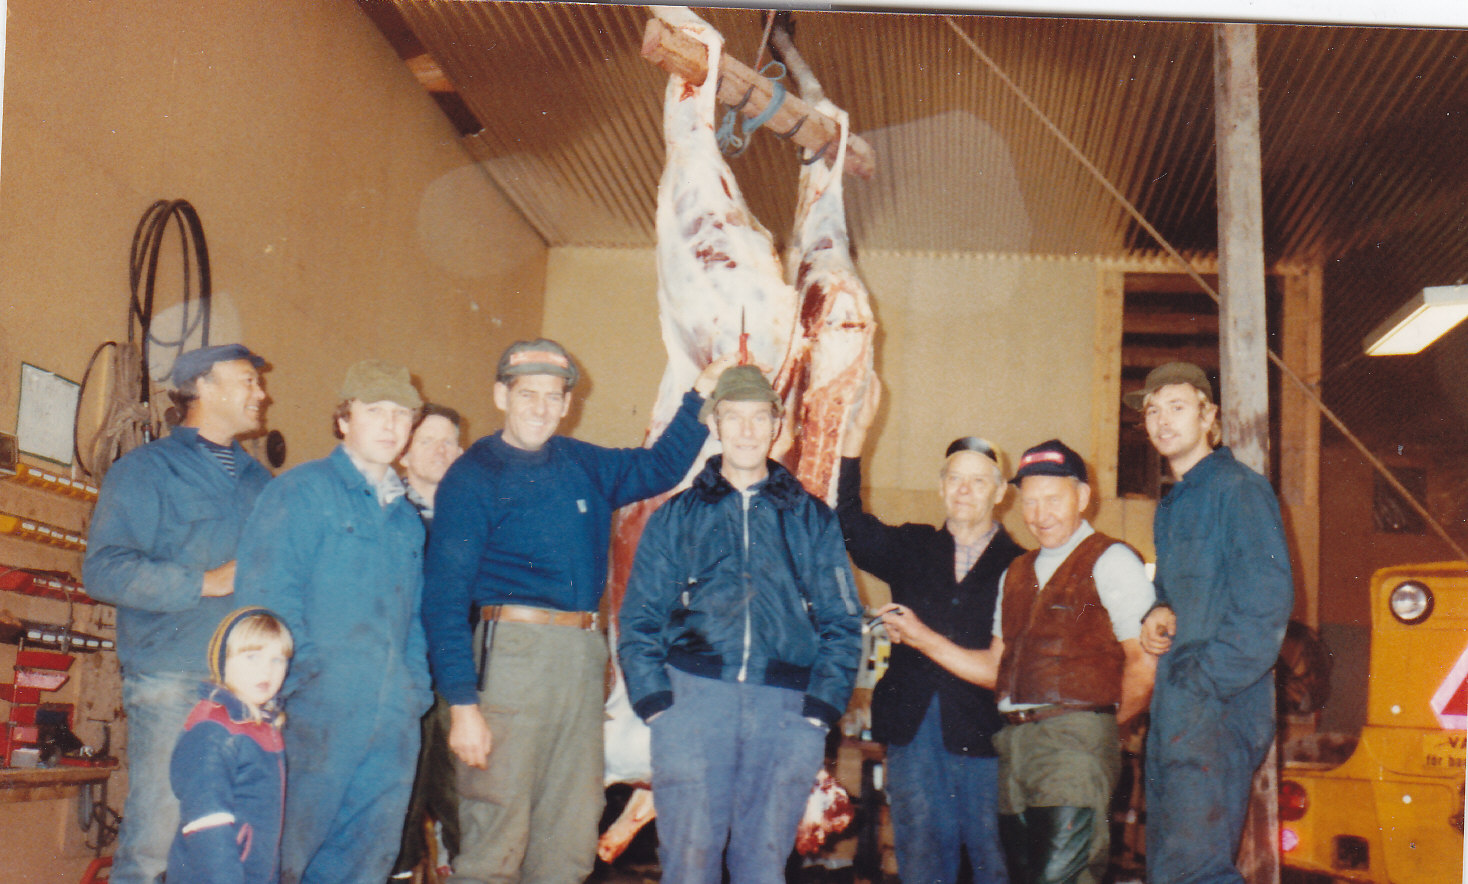 Senneby Jaktlag 1983. Bengt Lundin, Fredrik Reinsson, Lennart Reinsson, Henry Mattsson, Elex Pålsson, Göte Jansson, Ragnar Westerberg, Gösta Karlsson, Peter Jansson